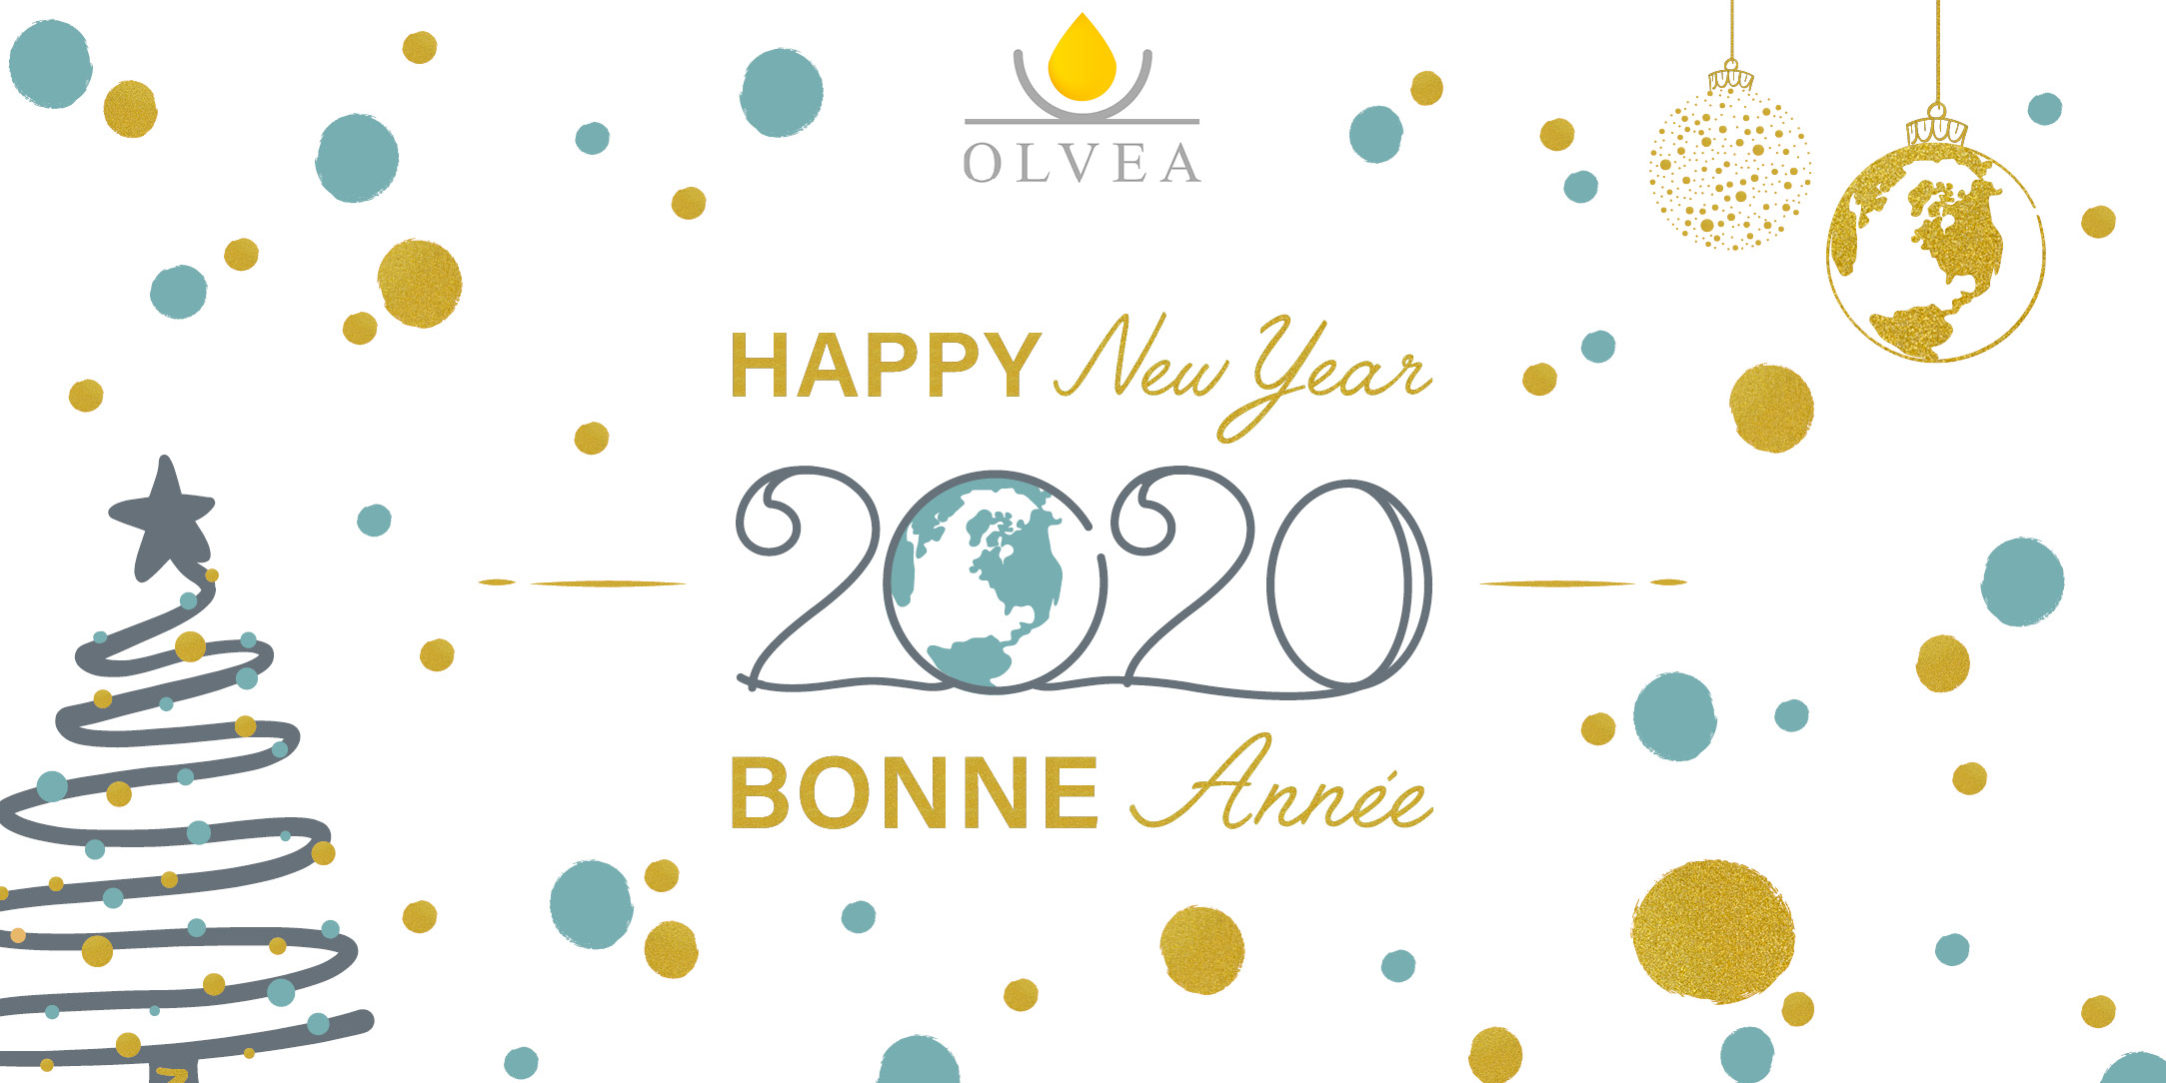 Happy New Year 2020! 1